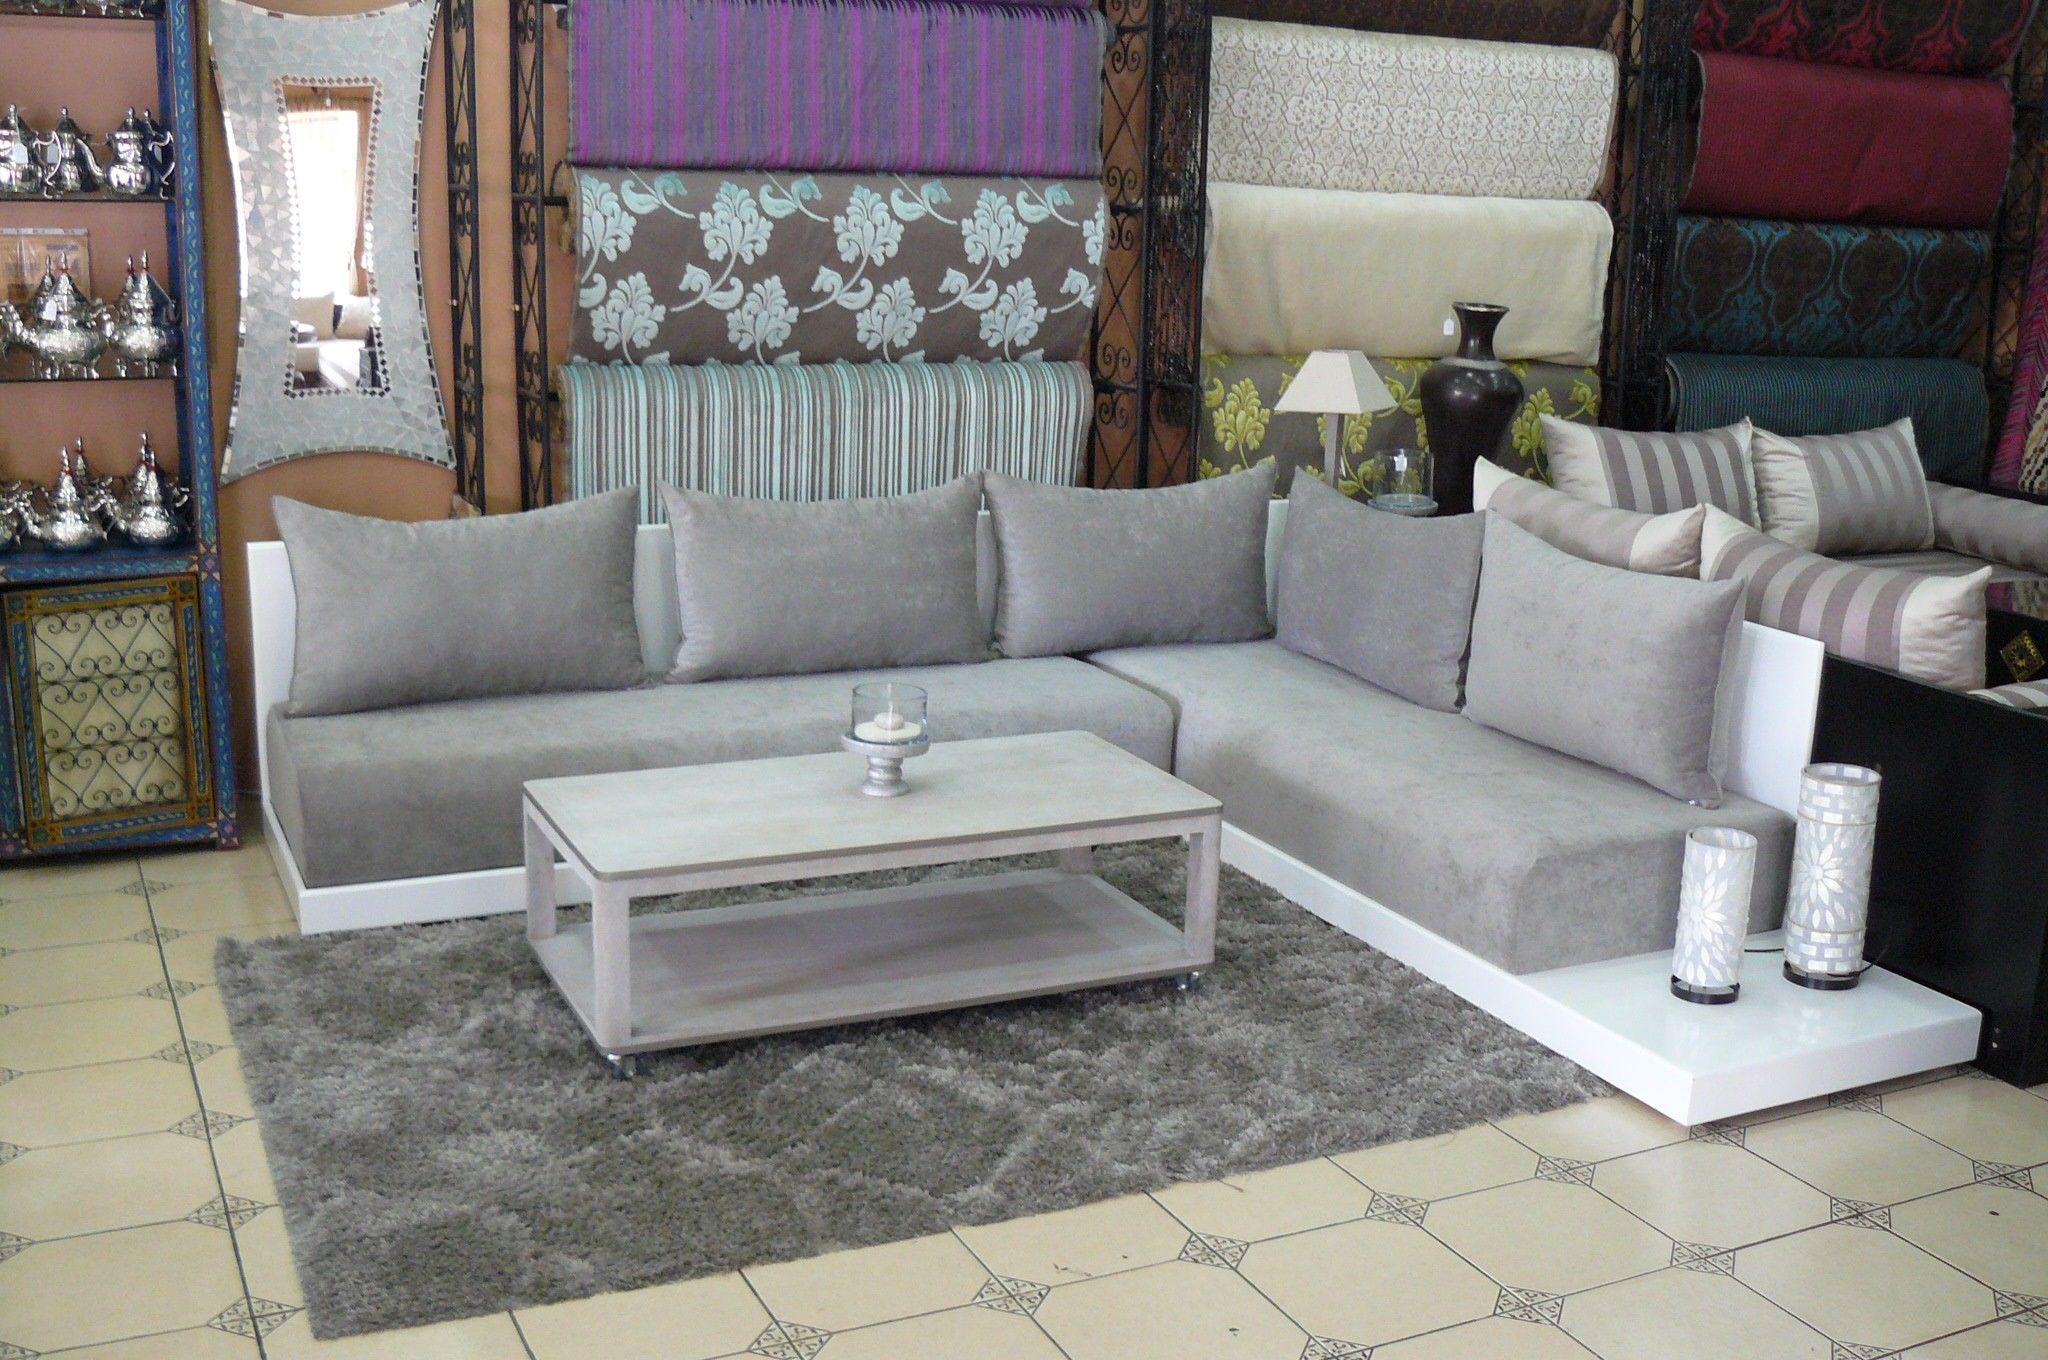 Salon Marocain Designe 8 Akrongvf Avec Salon Marocain ...